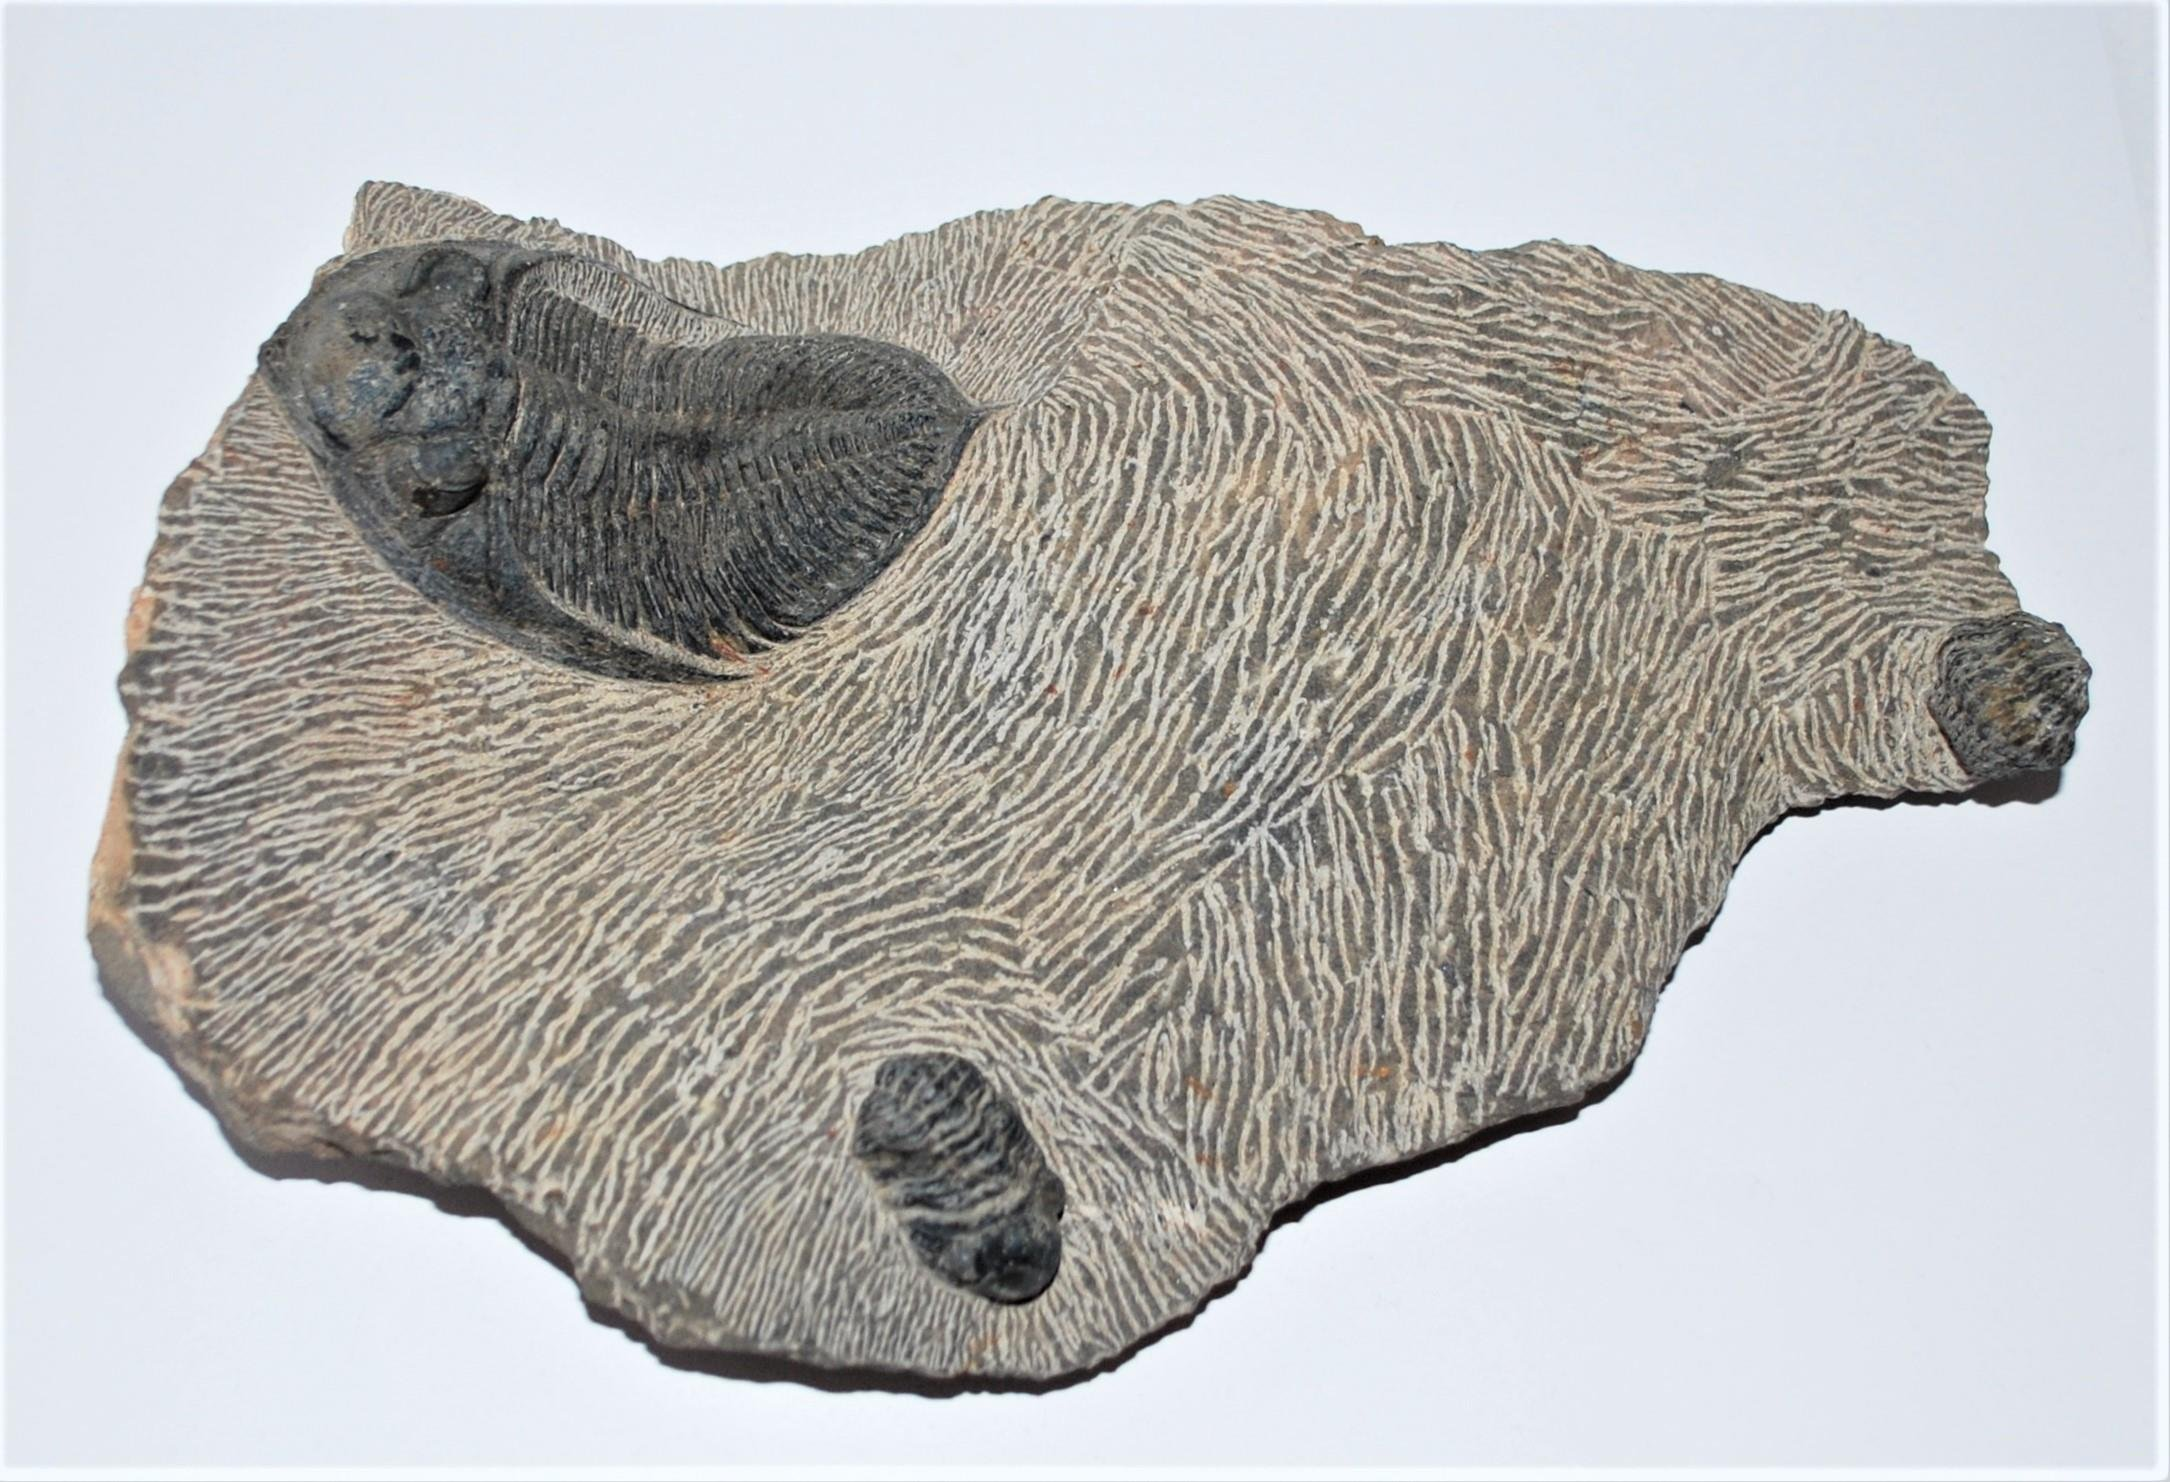 Odontochile, Reedops & Crotalocephalus TRILOBITES Fossil 400 Mil Yr Old #2846